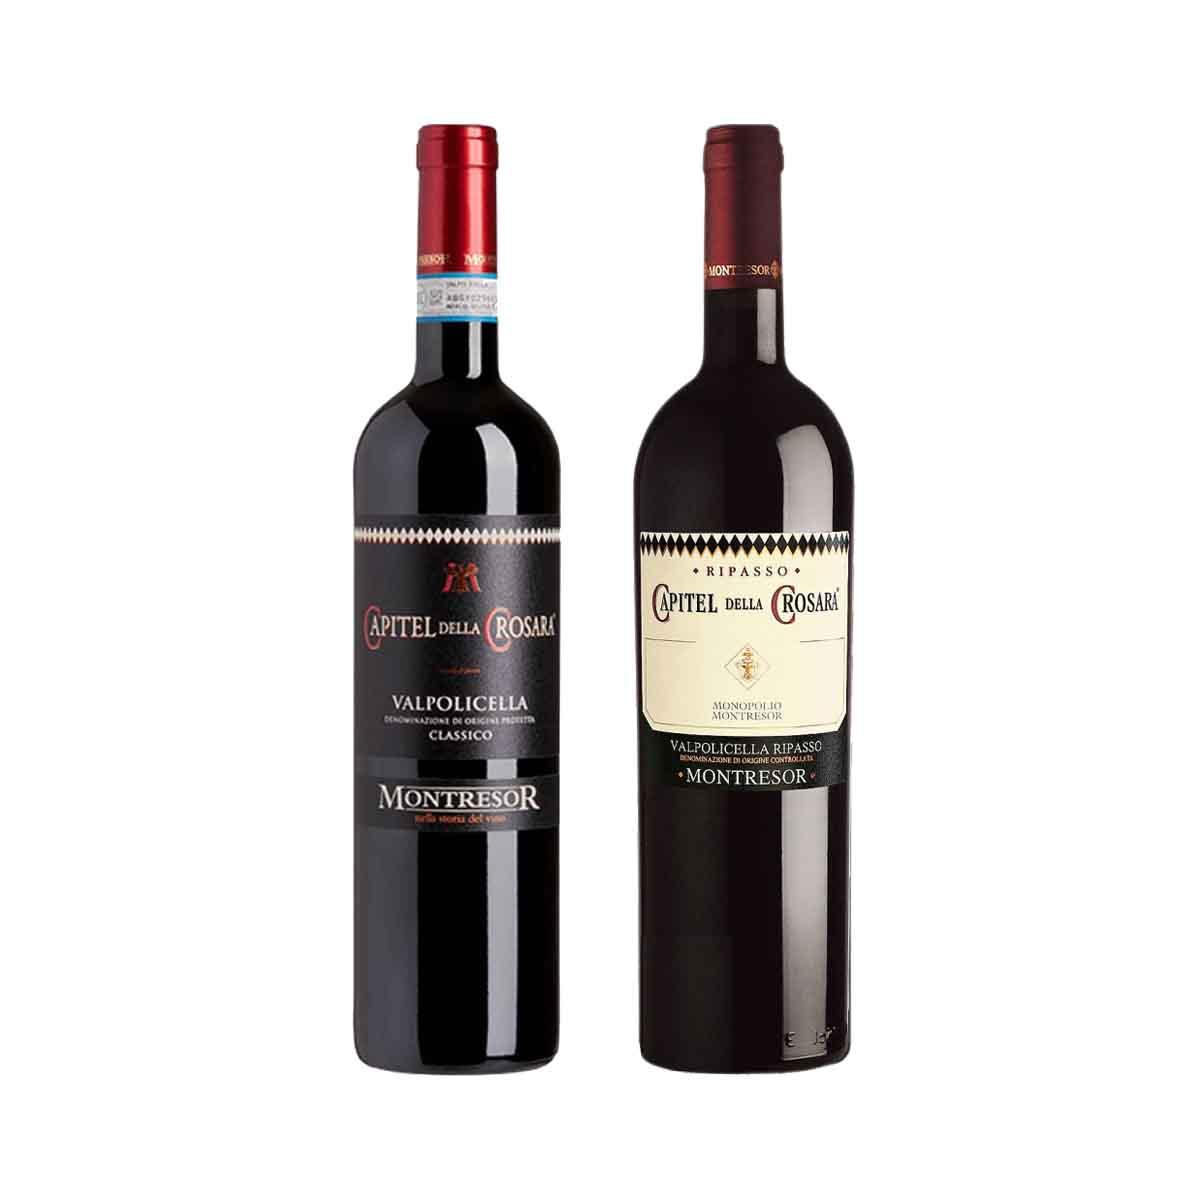 Kit 2x Vinho Tinto Italiano Montresor Capitel Della Crosara Valpolicella Classico/Ripasso 750ml